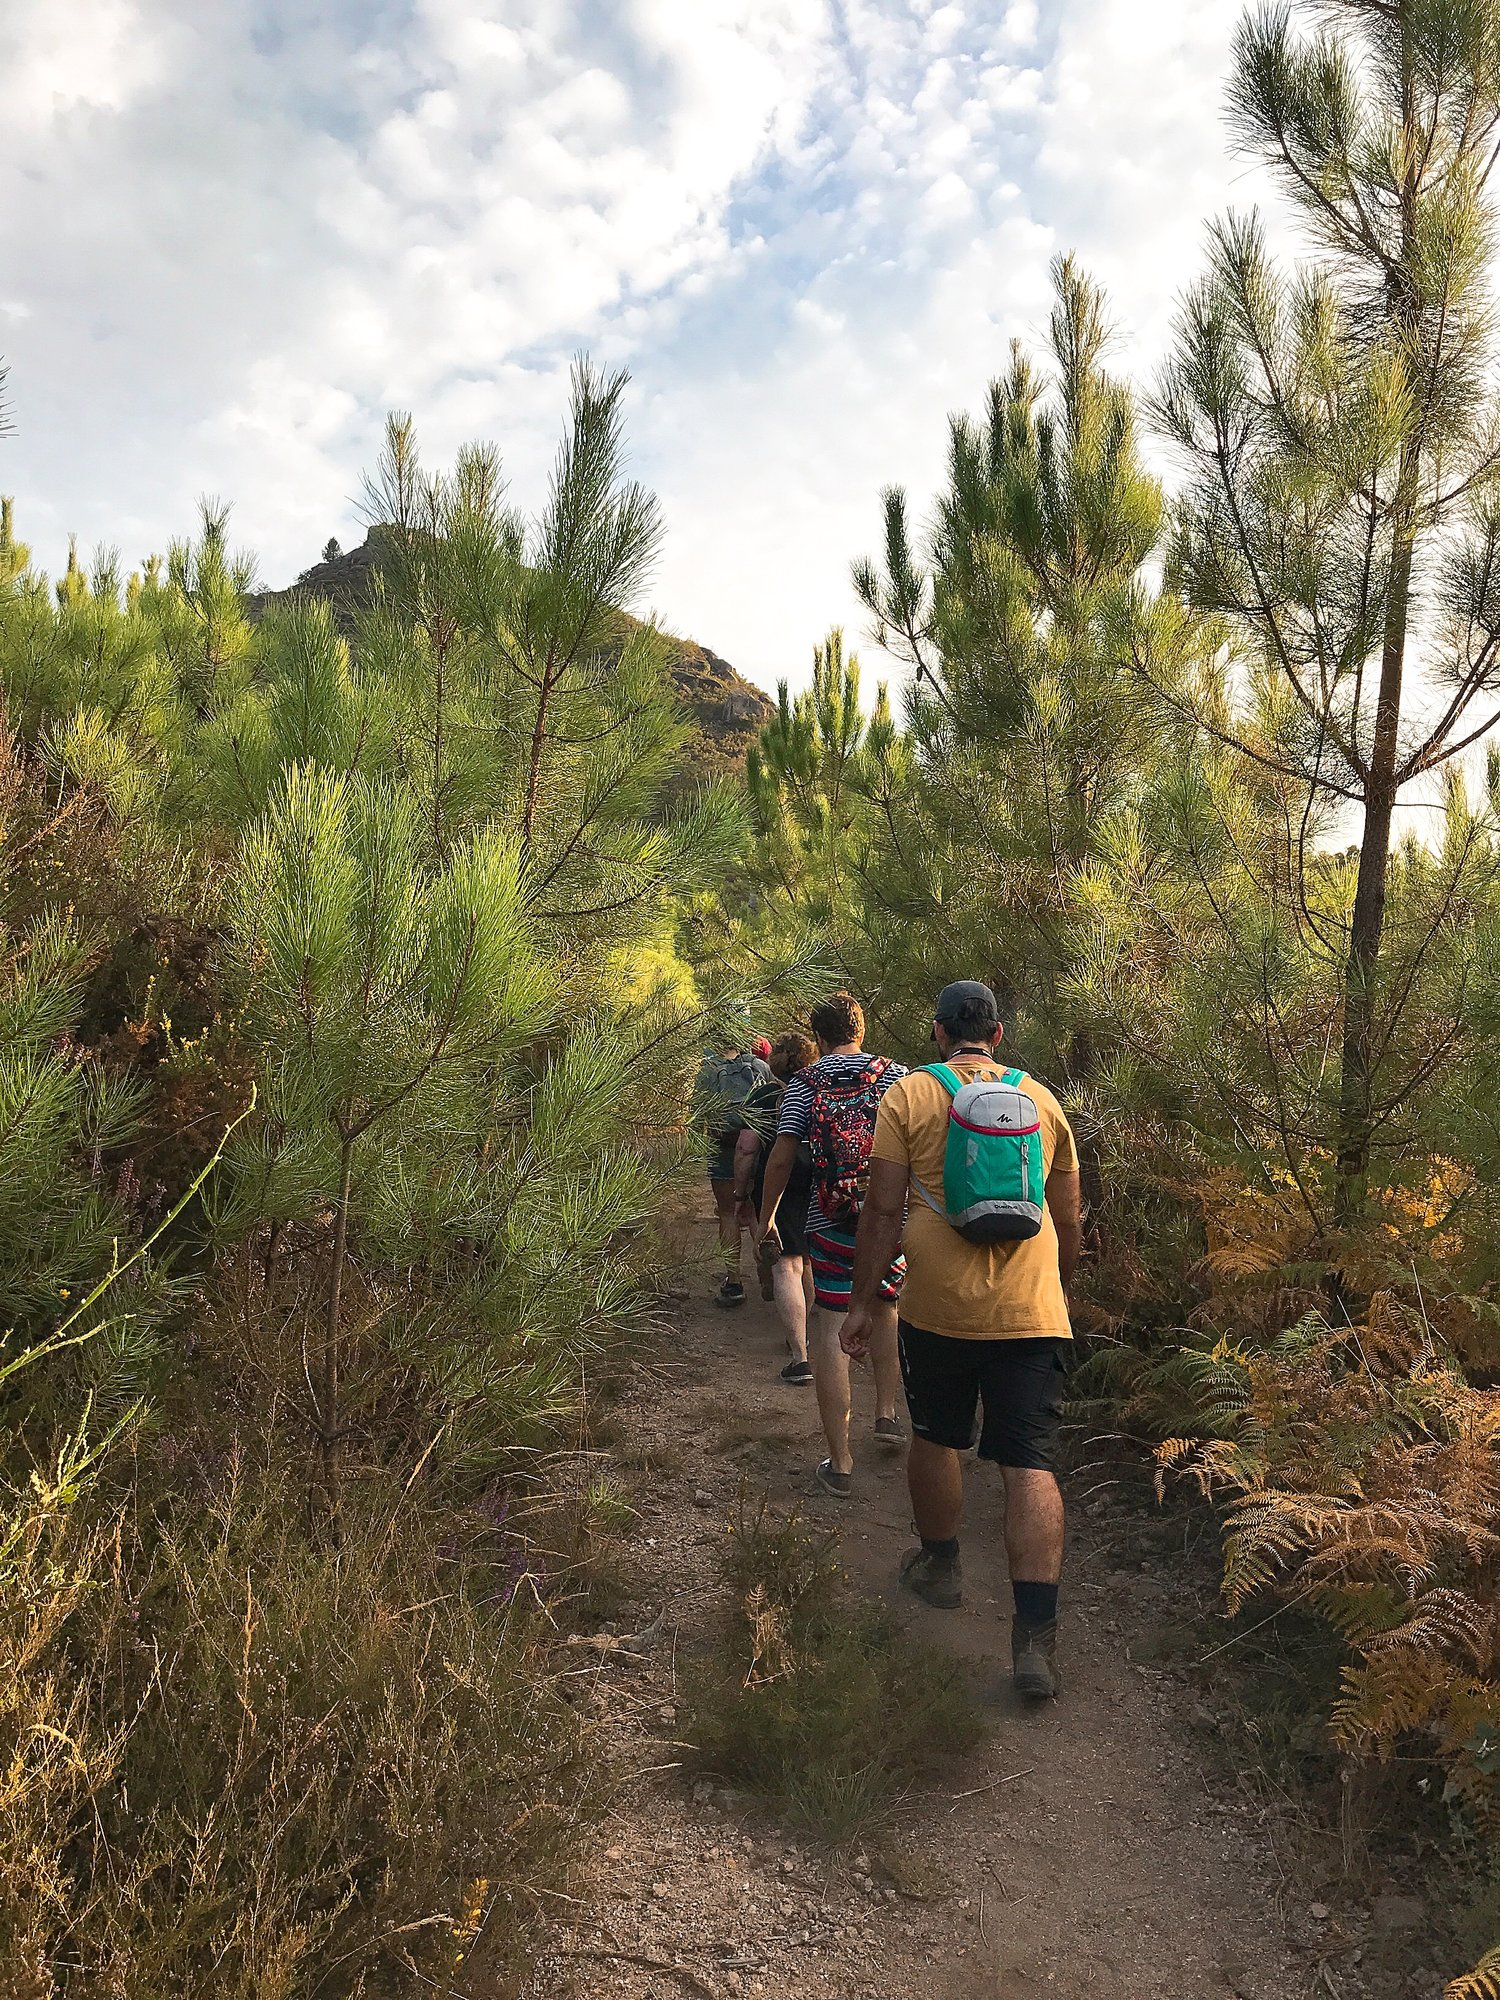 vilarinho-das-fumas-hike.jpg